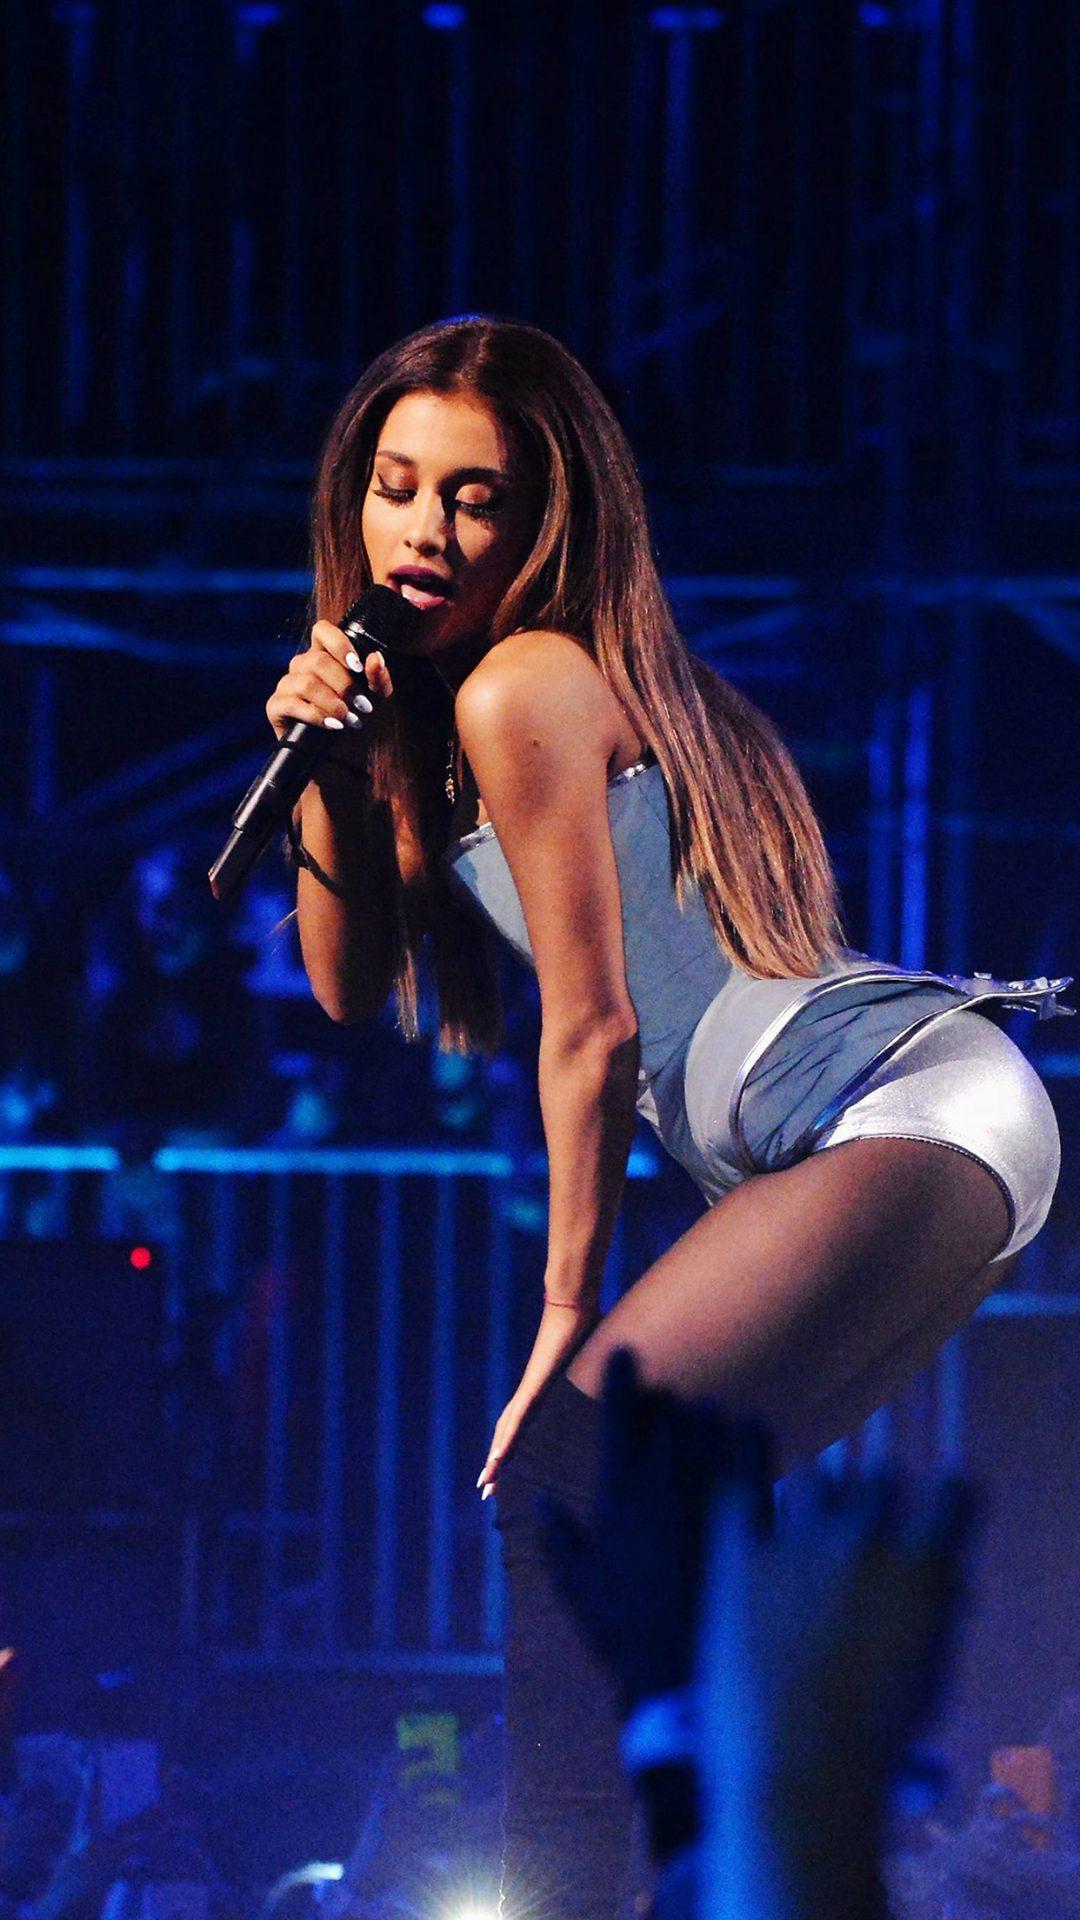 Ariana Grande Music Concert Blue